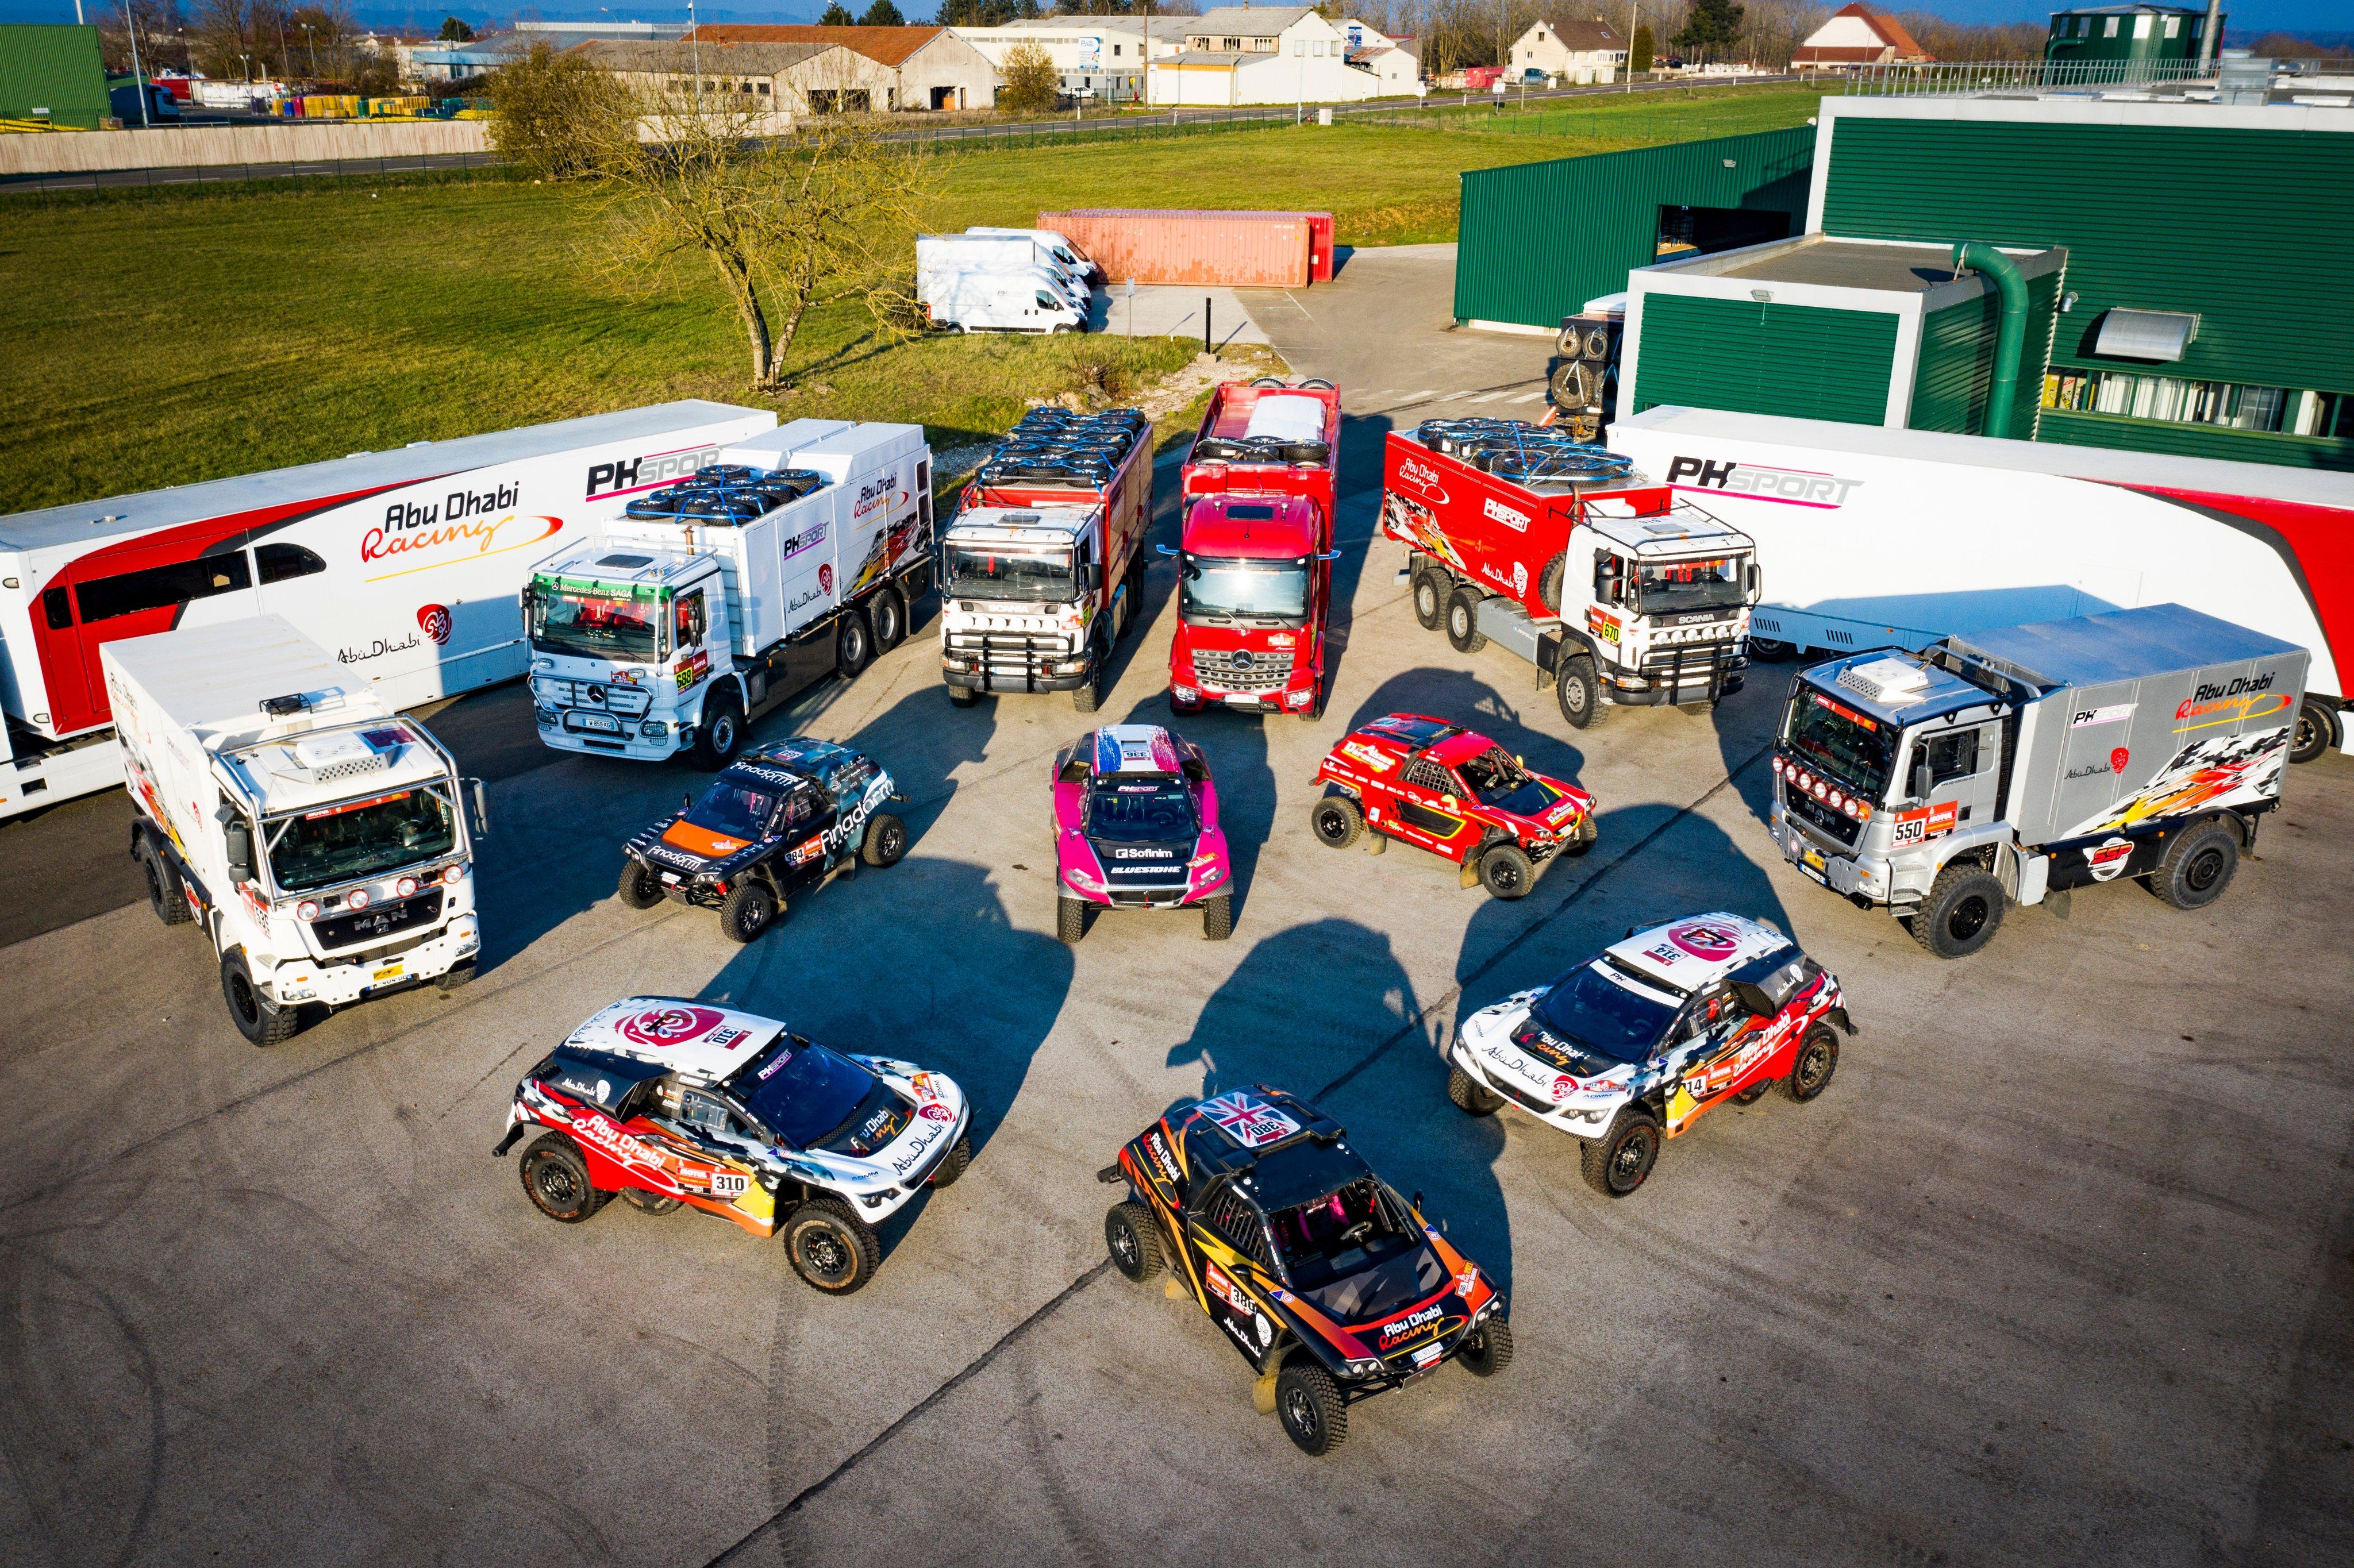 2021 43º Rallye Raid Dakar - Arabia Saudí [3-15 Enero] - Página 2 EoJ1GqNXYAEB-lb?format=jpg&name=4096x4096